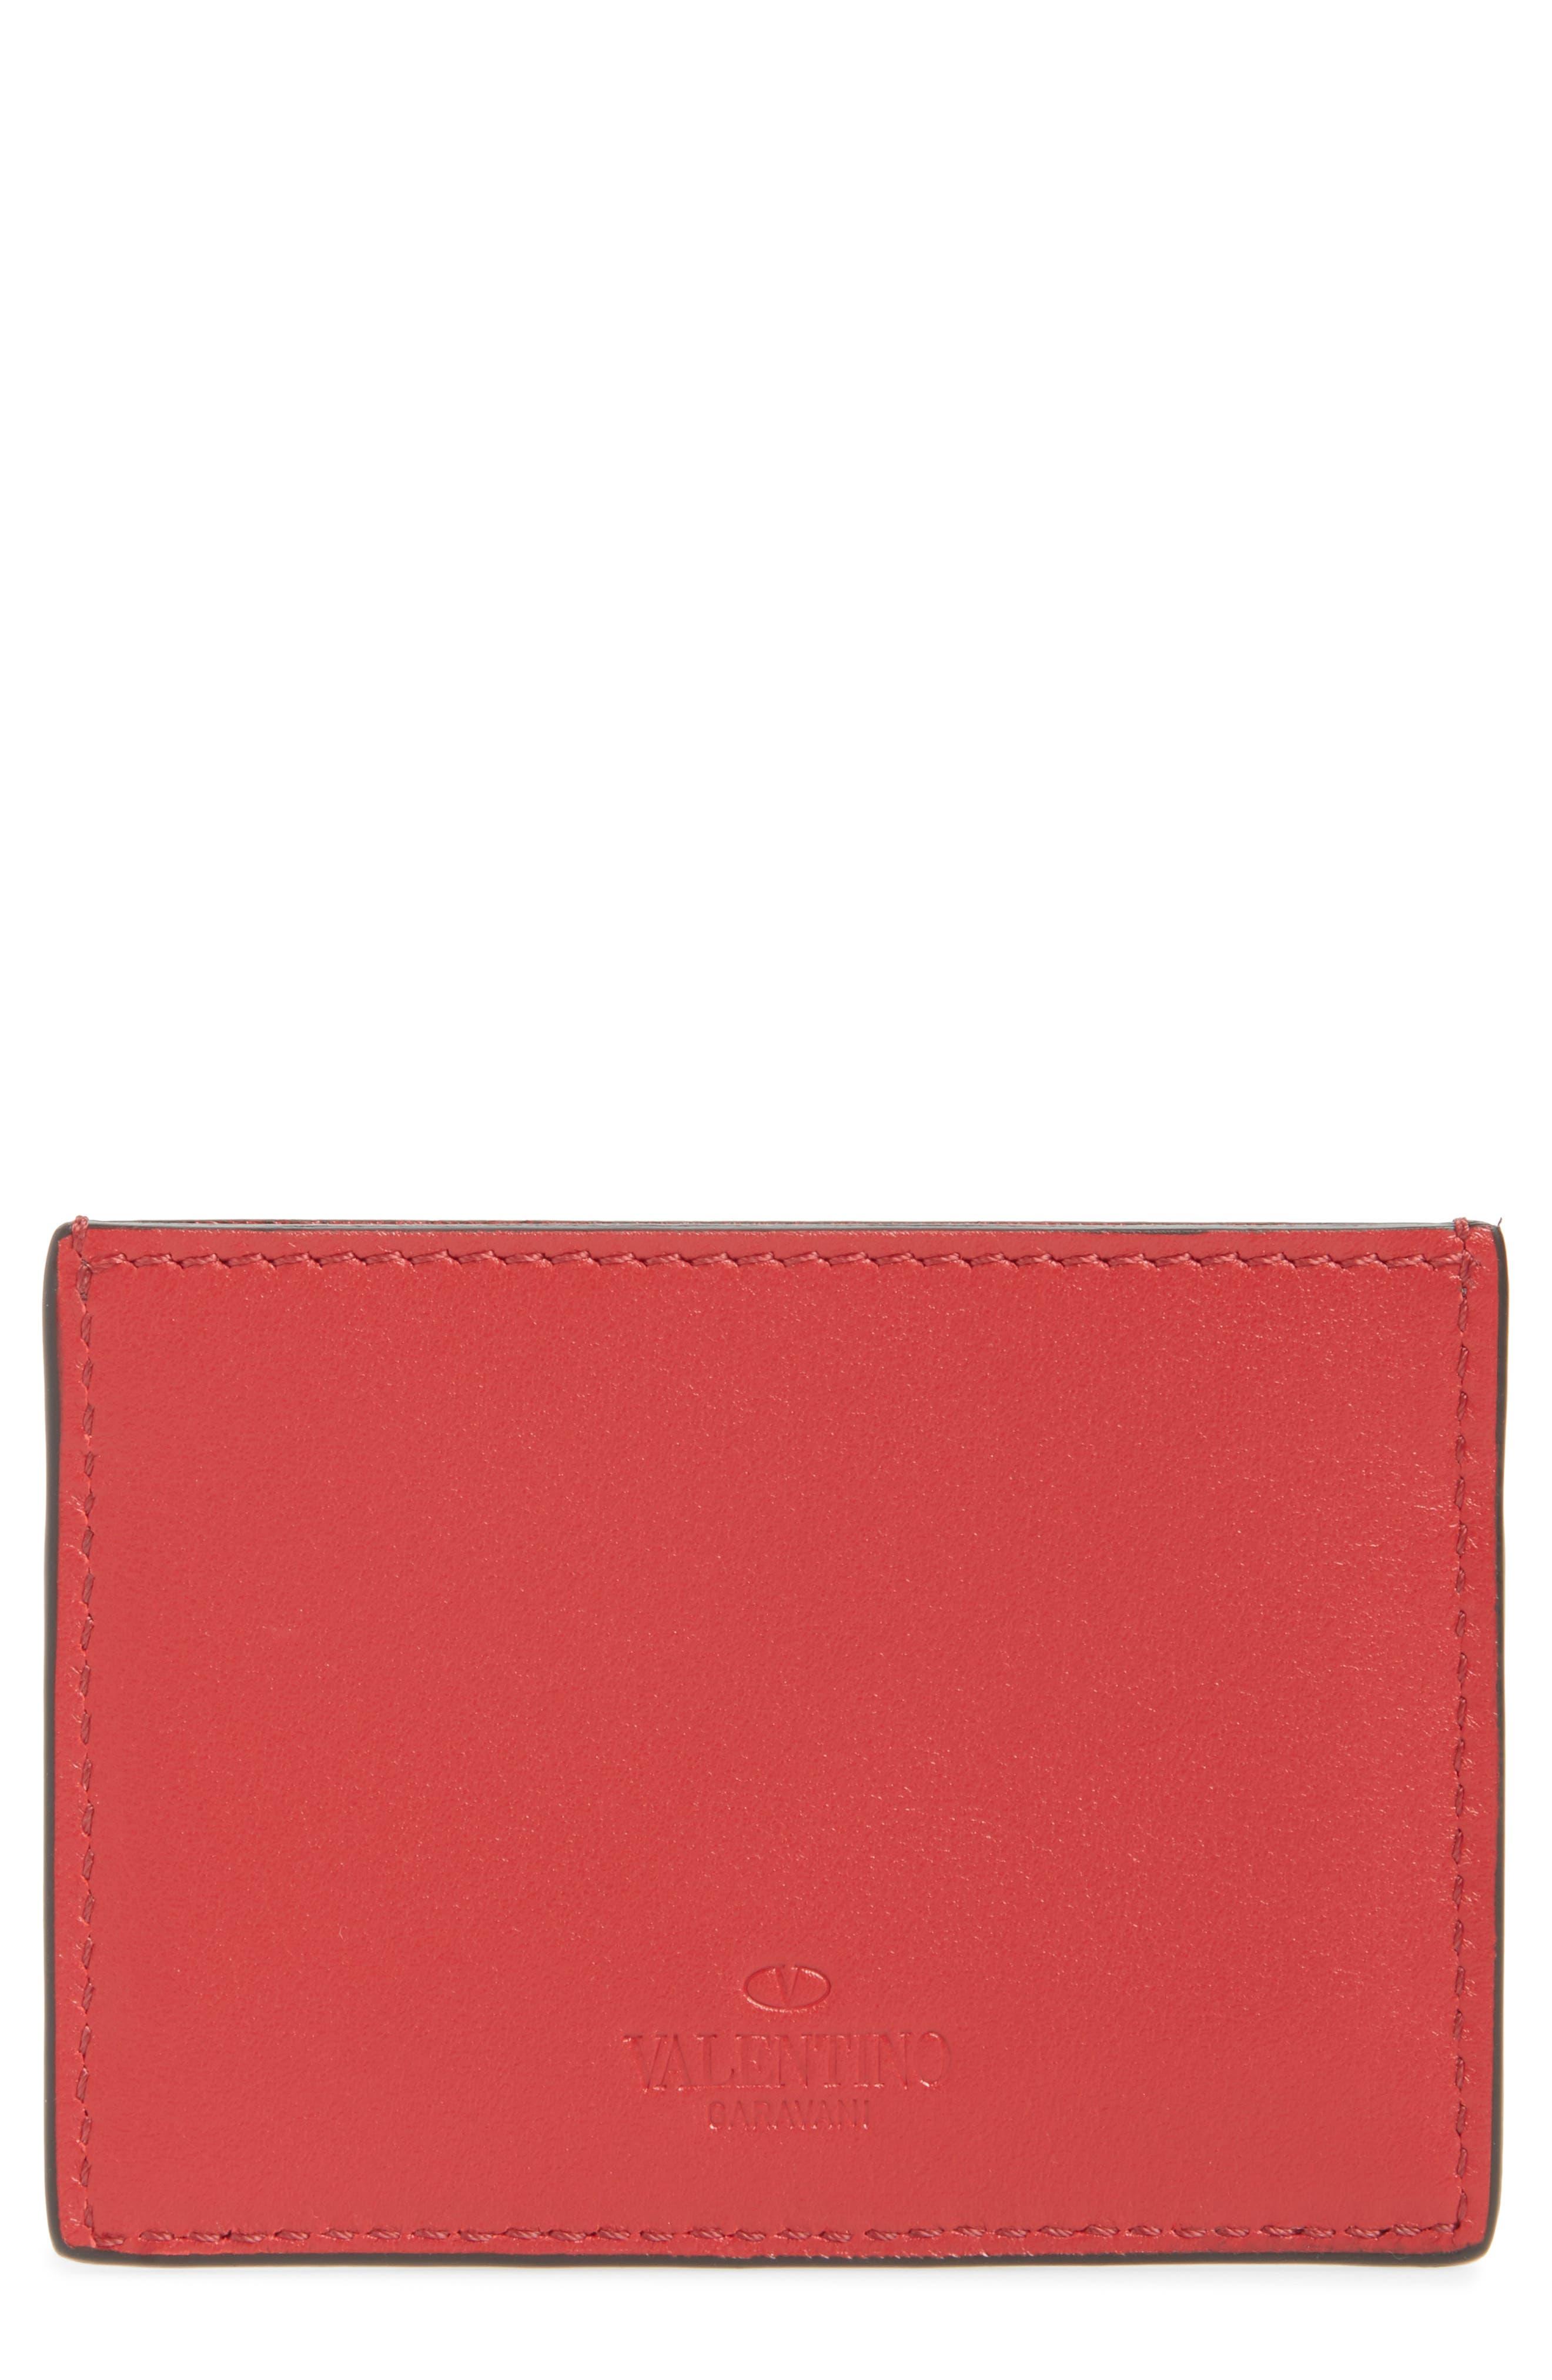 GARAVANI Stud Leather Card Case,                             Alternate thumbnail 2, color,                             Red